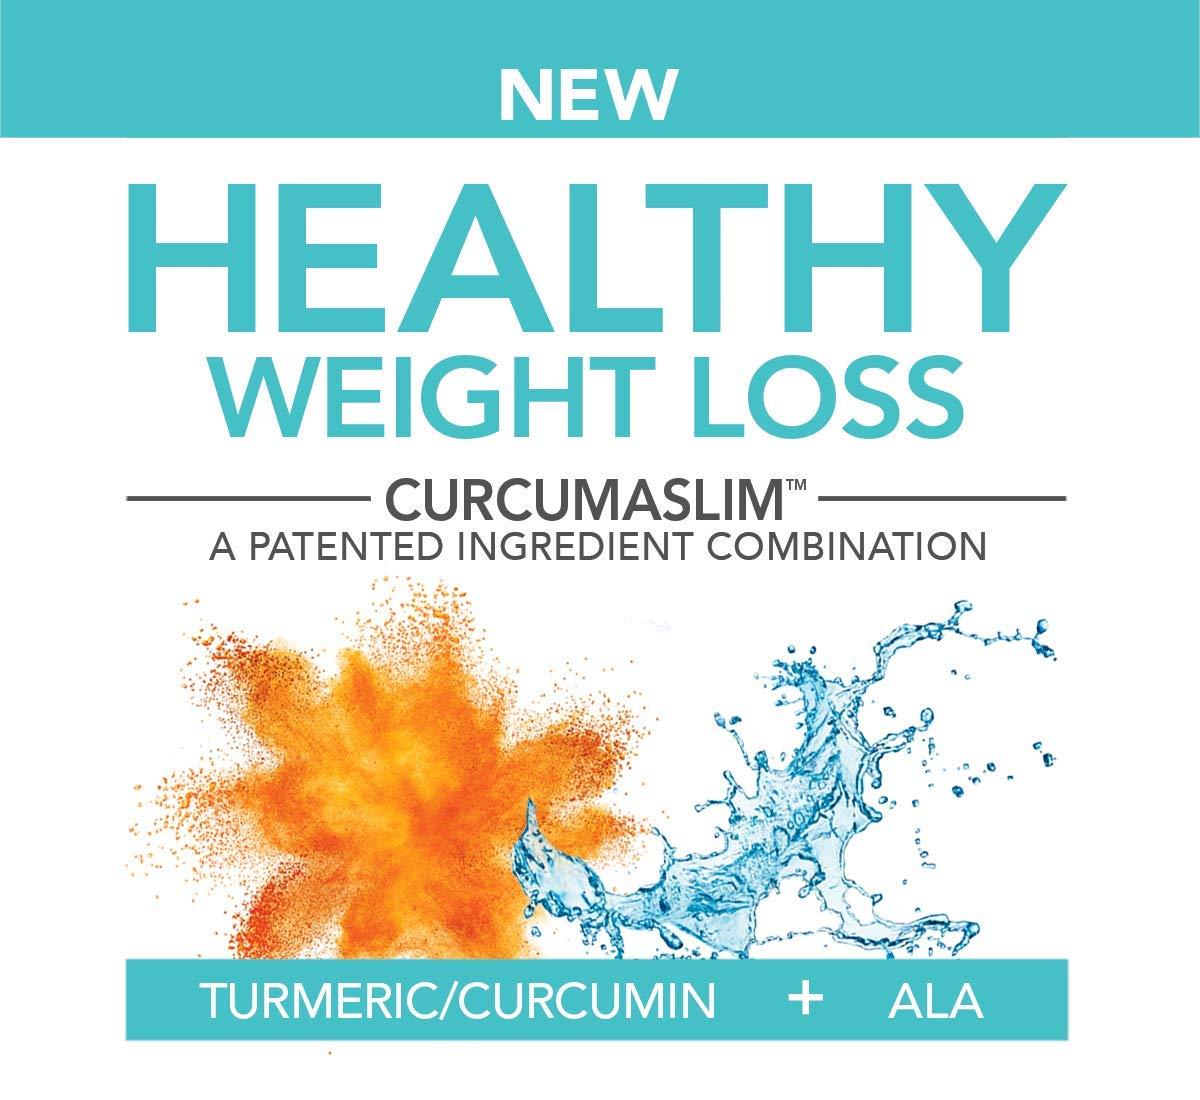 Hydroxycut Ultra Lean Healthy Weight Loss, Turmeric Curcumin & Alpha Lipoic  Acid Supplement,